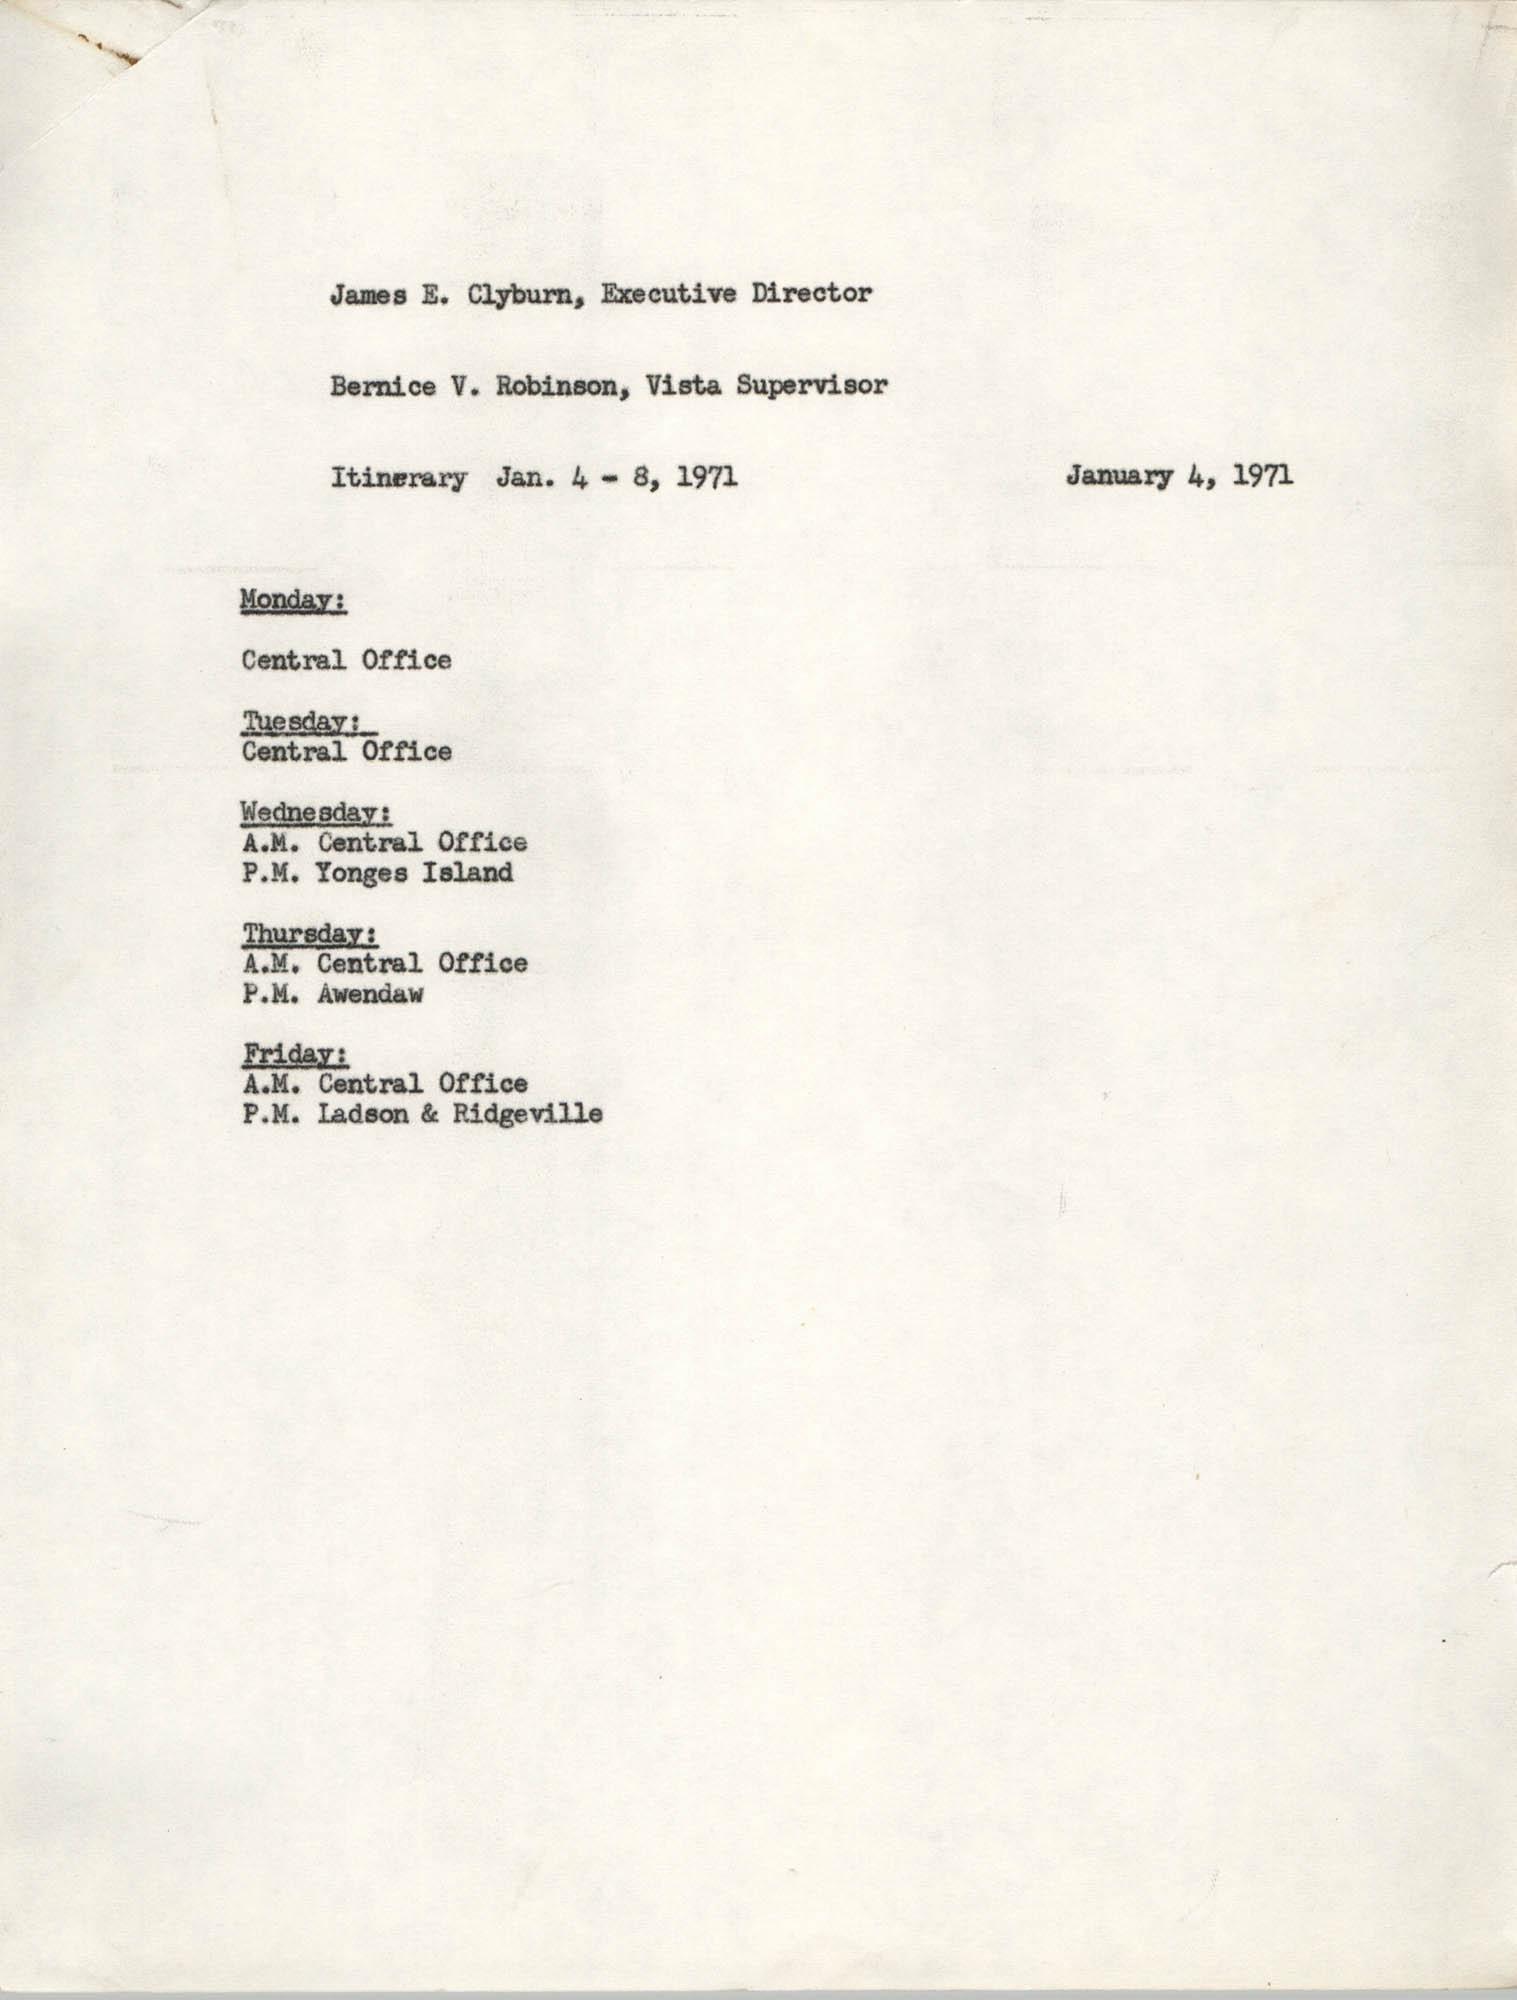 Memorandum from Bernice V. Robinson to James E. Clyburn, January 4, 1971